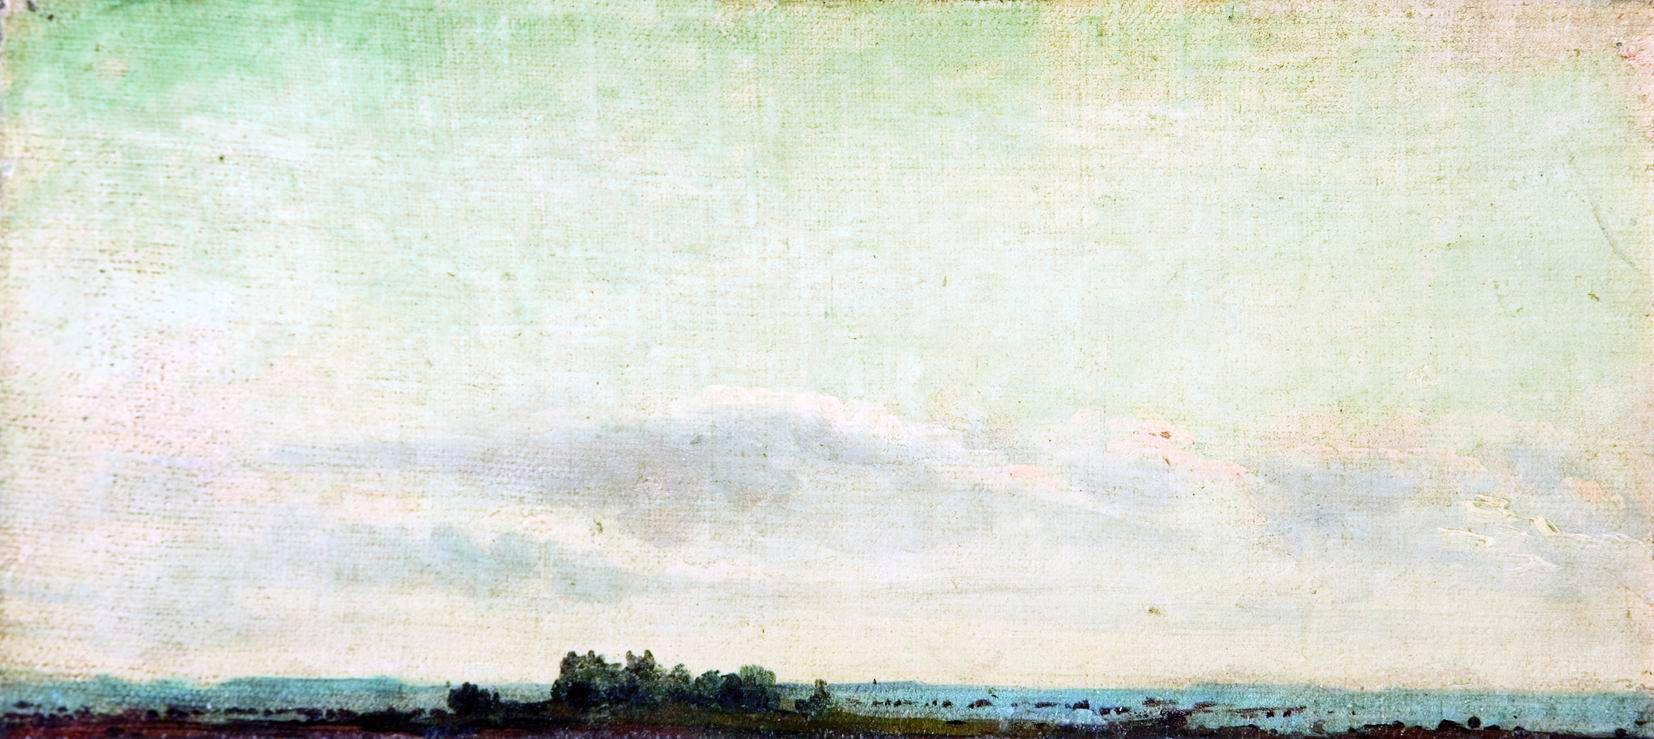 Исаак Ильич Левитан. Пейзаж. Дали